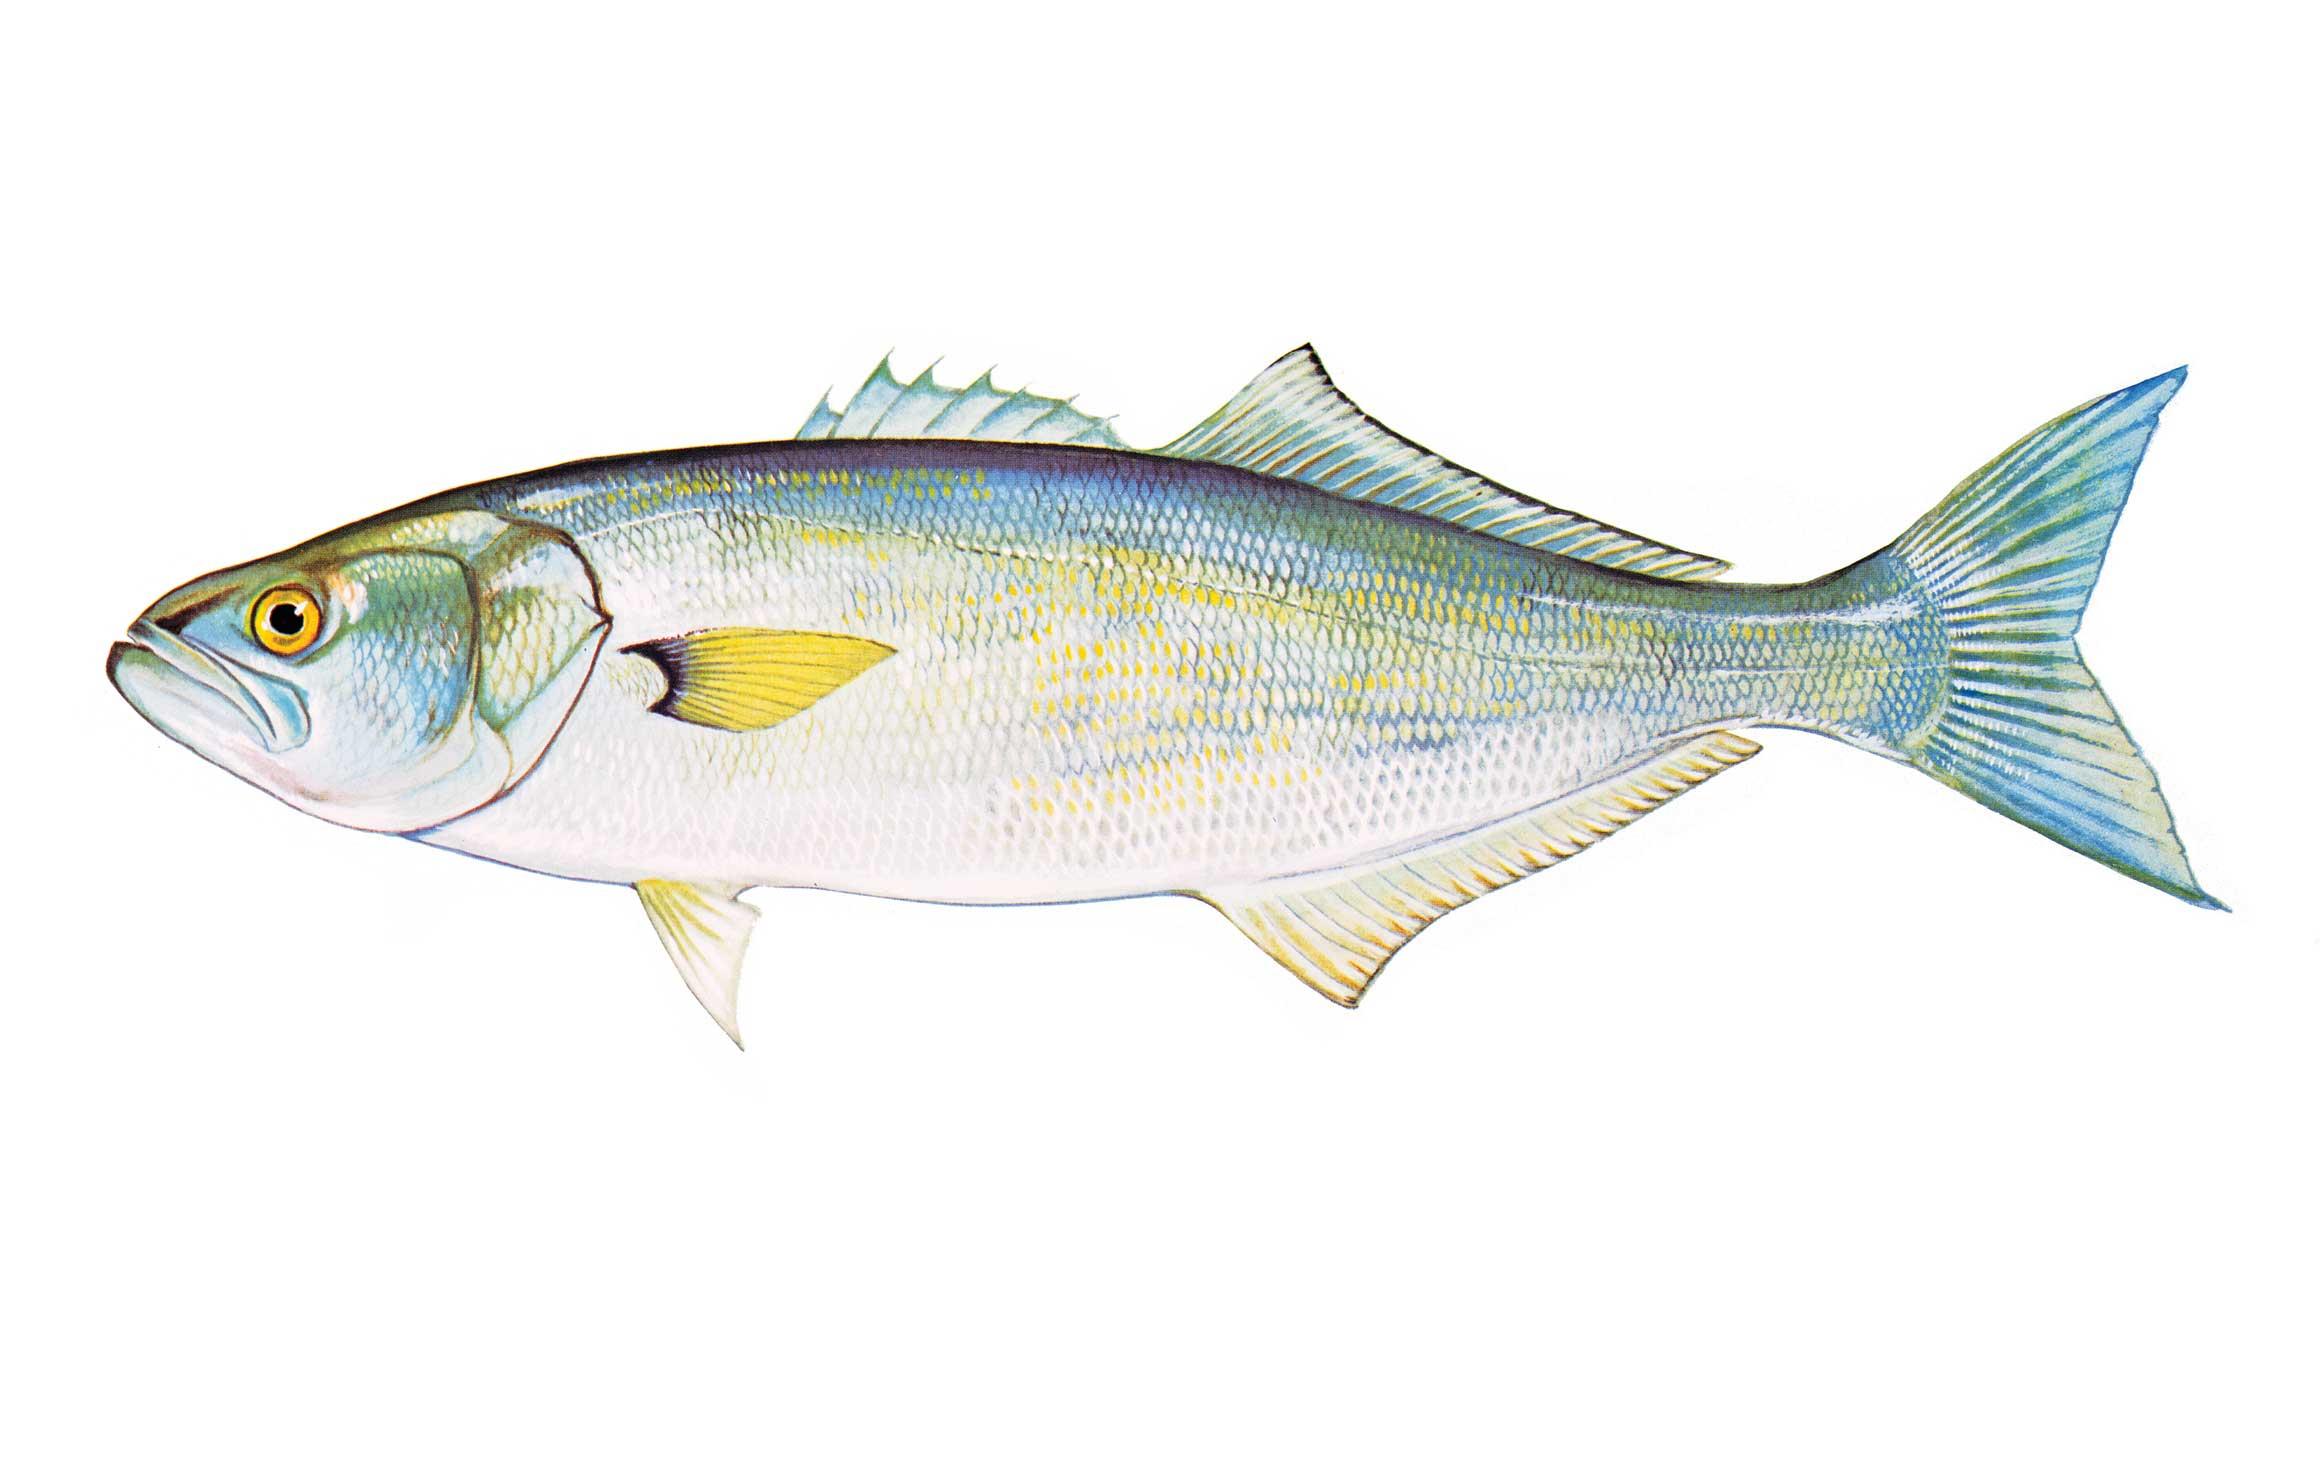 Freshwater fish nc - Bluefish